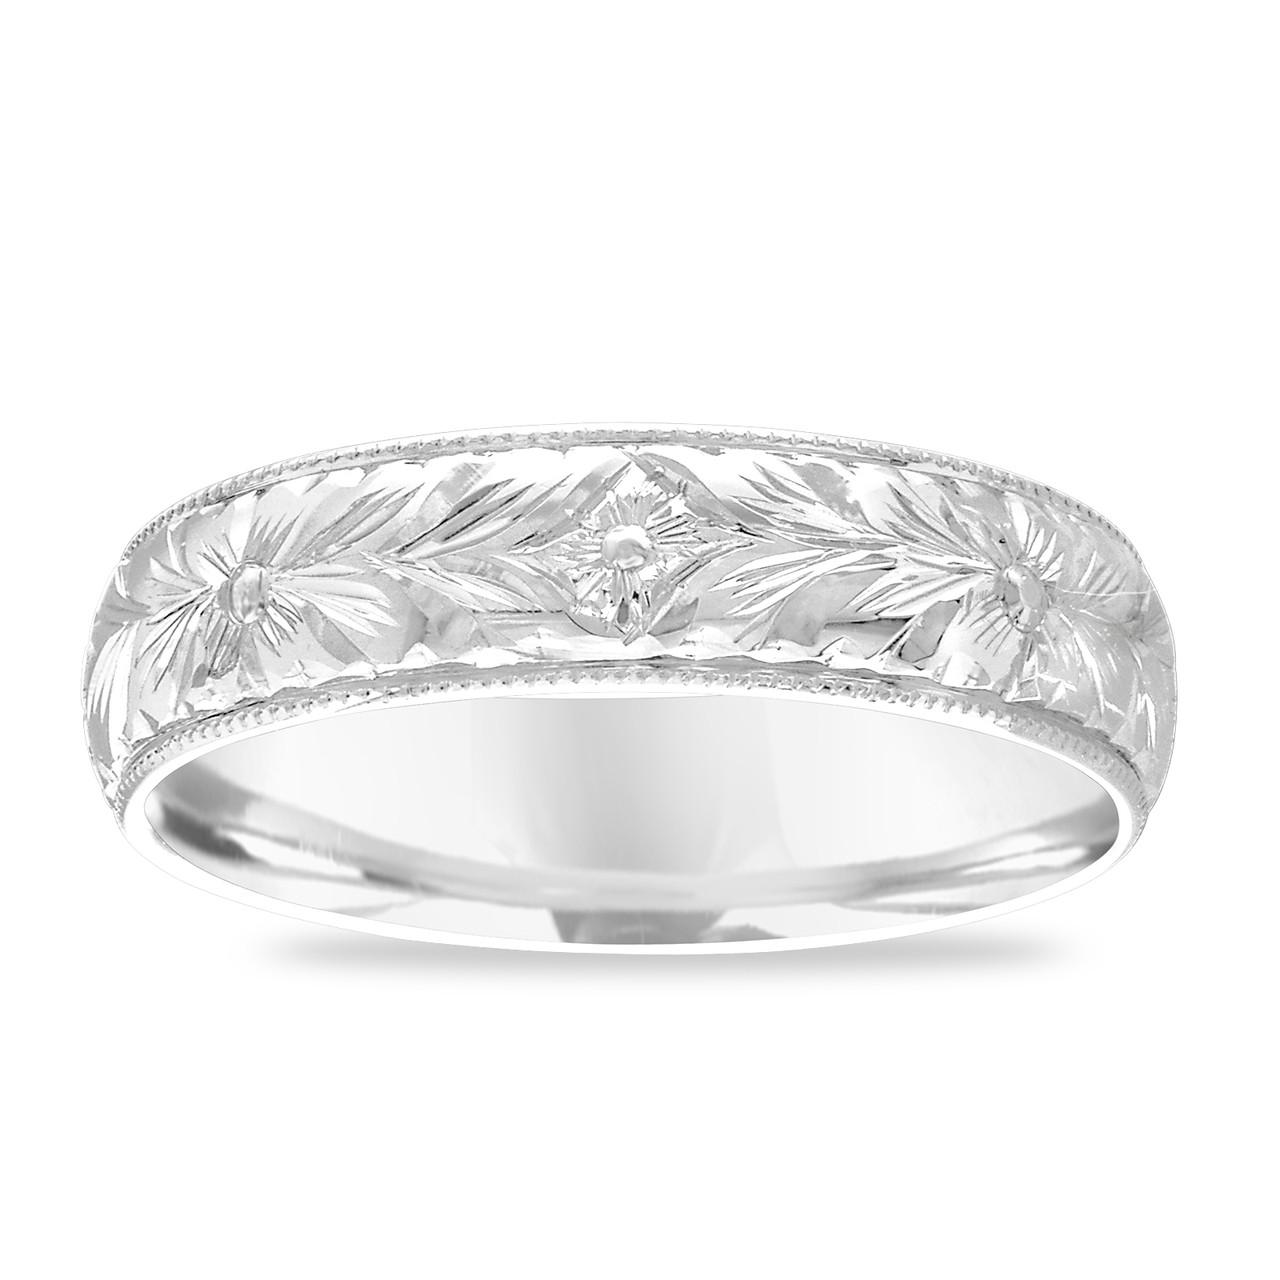 Unique Wedding Bands Platinum: Hand Engraved Men's Wedding Band, Platinum Wedding Ring